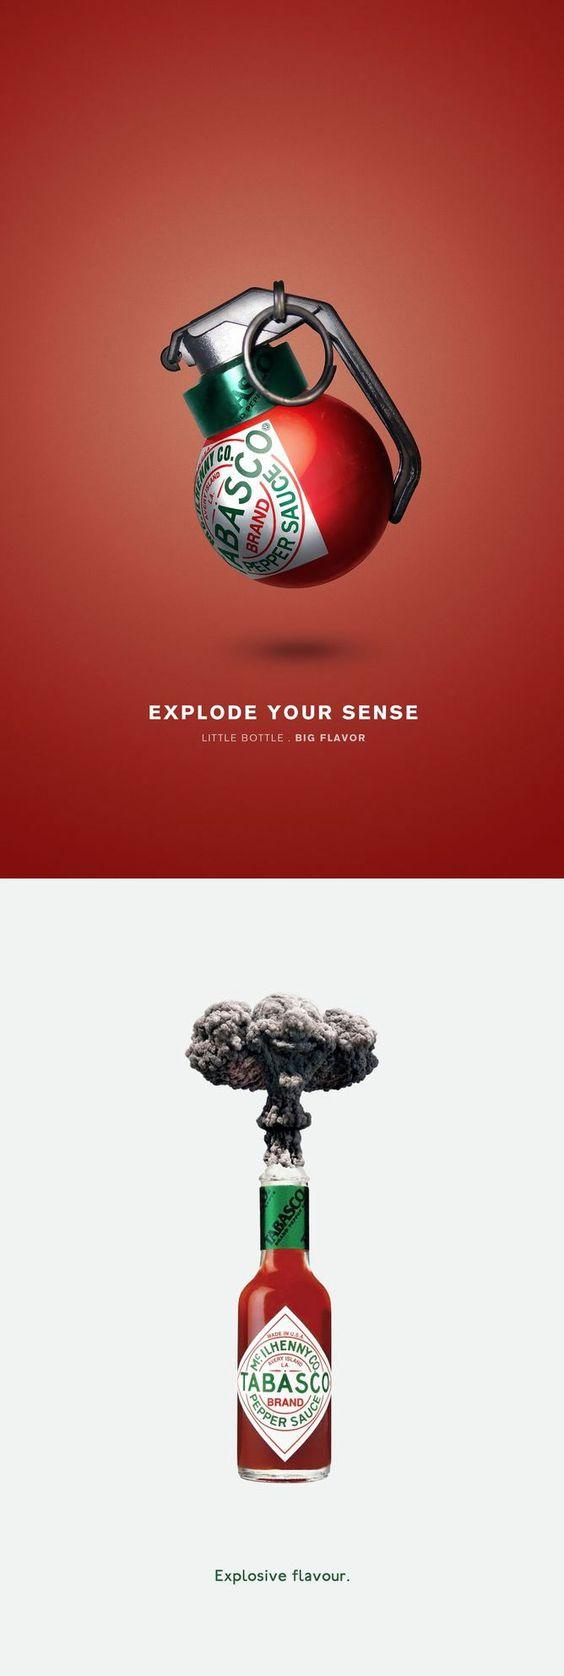 creative-print-ads (20)